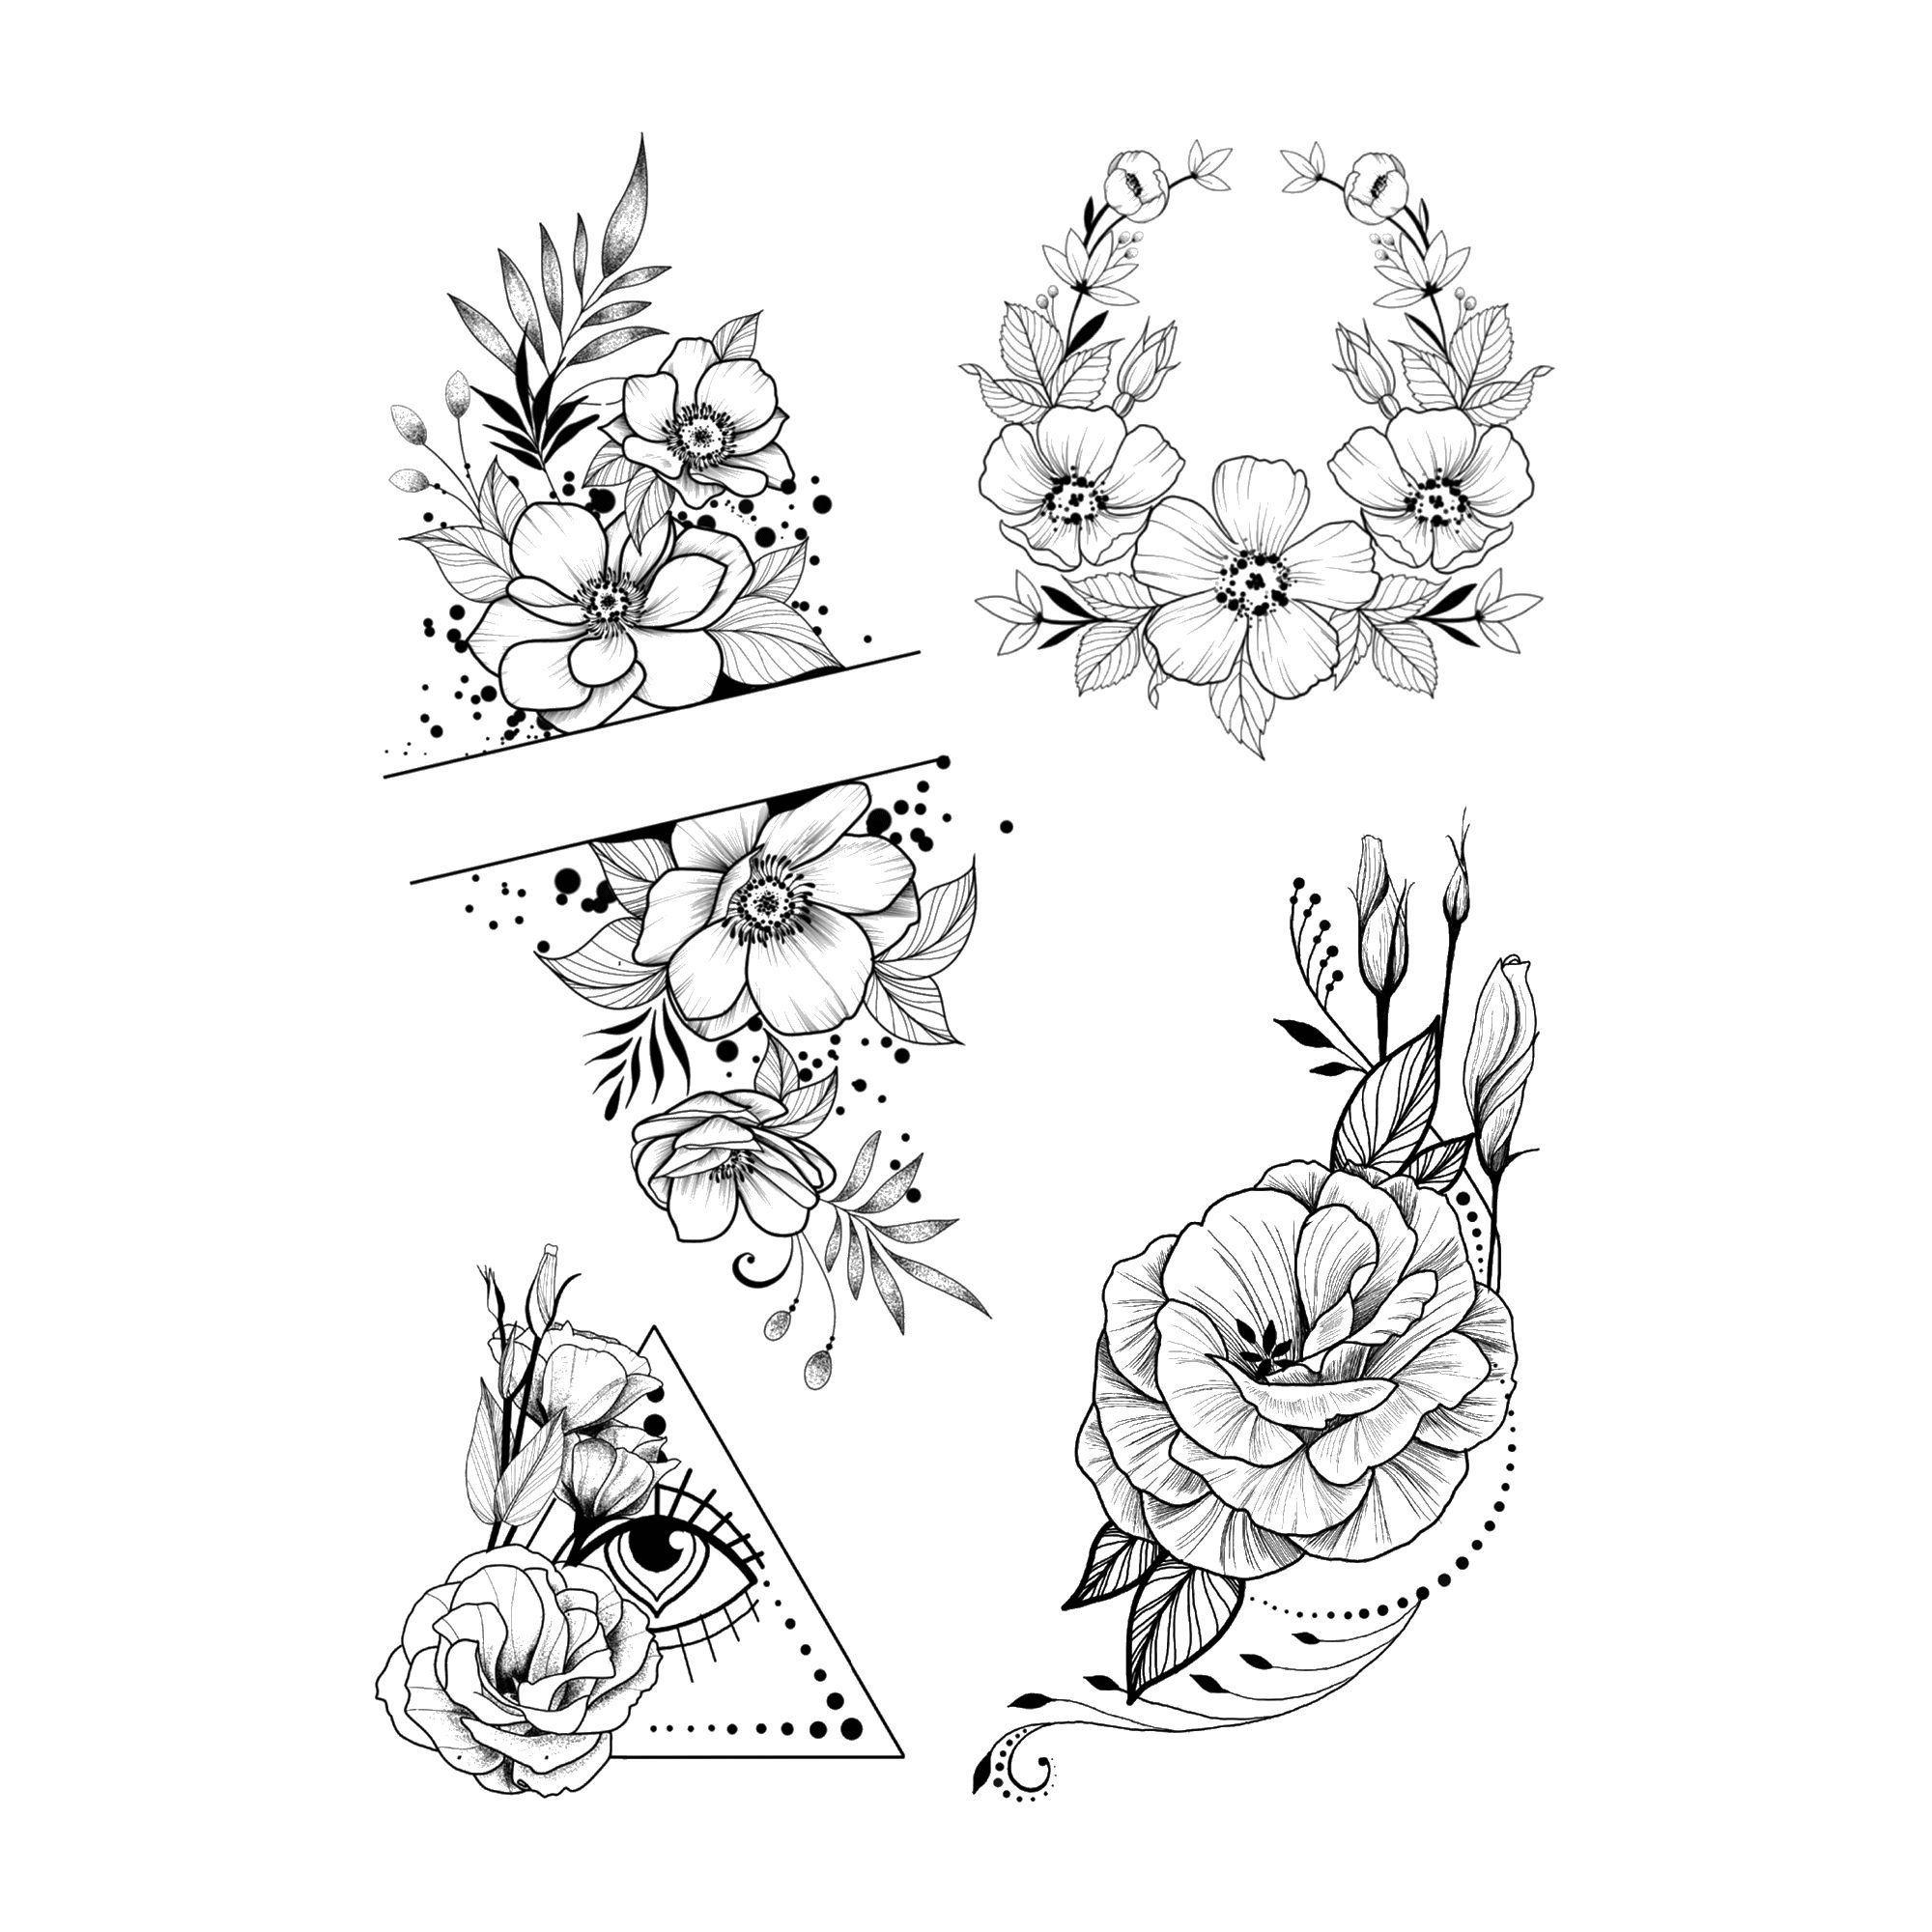 Summer blossoms Temporary Tattoo / Black dots tattoo / Wreath of flowers Thigh tattoo for girl / Black flower tattoo / Classy women tattoo